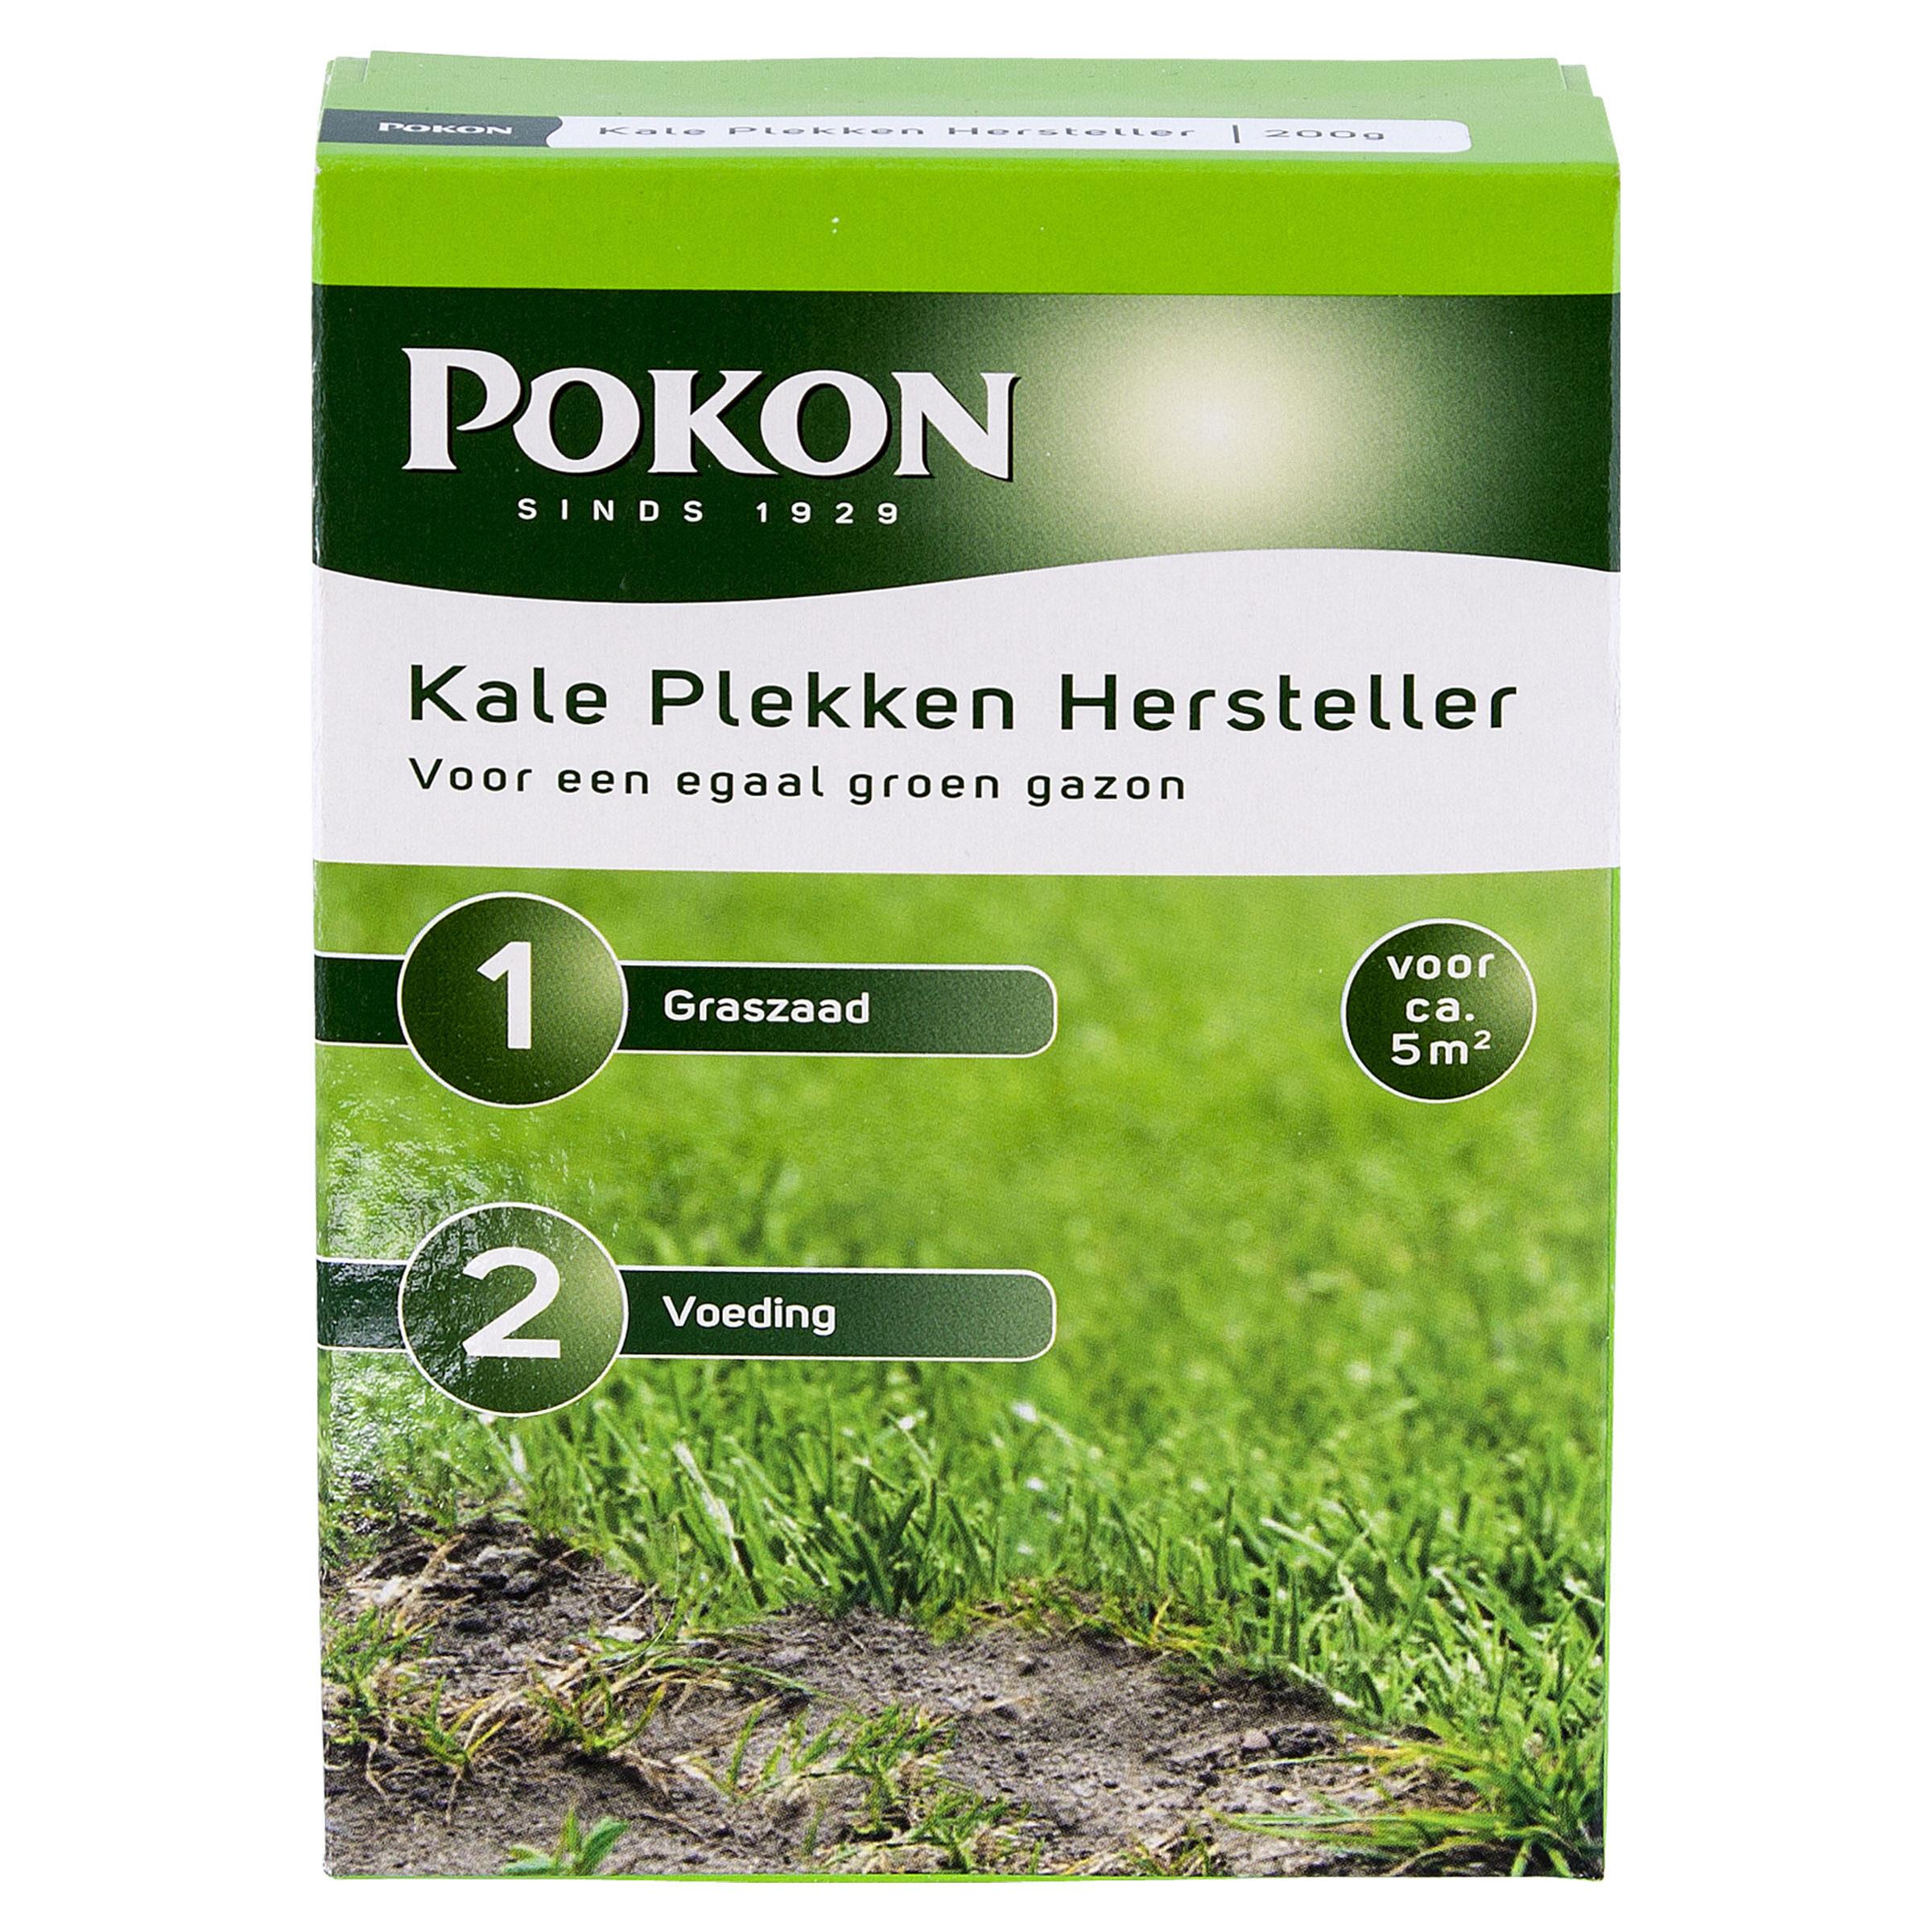 Pokon Kale Plekken Hersteller 200gr voorkant